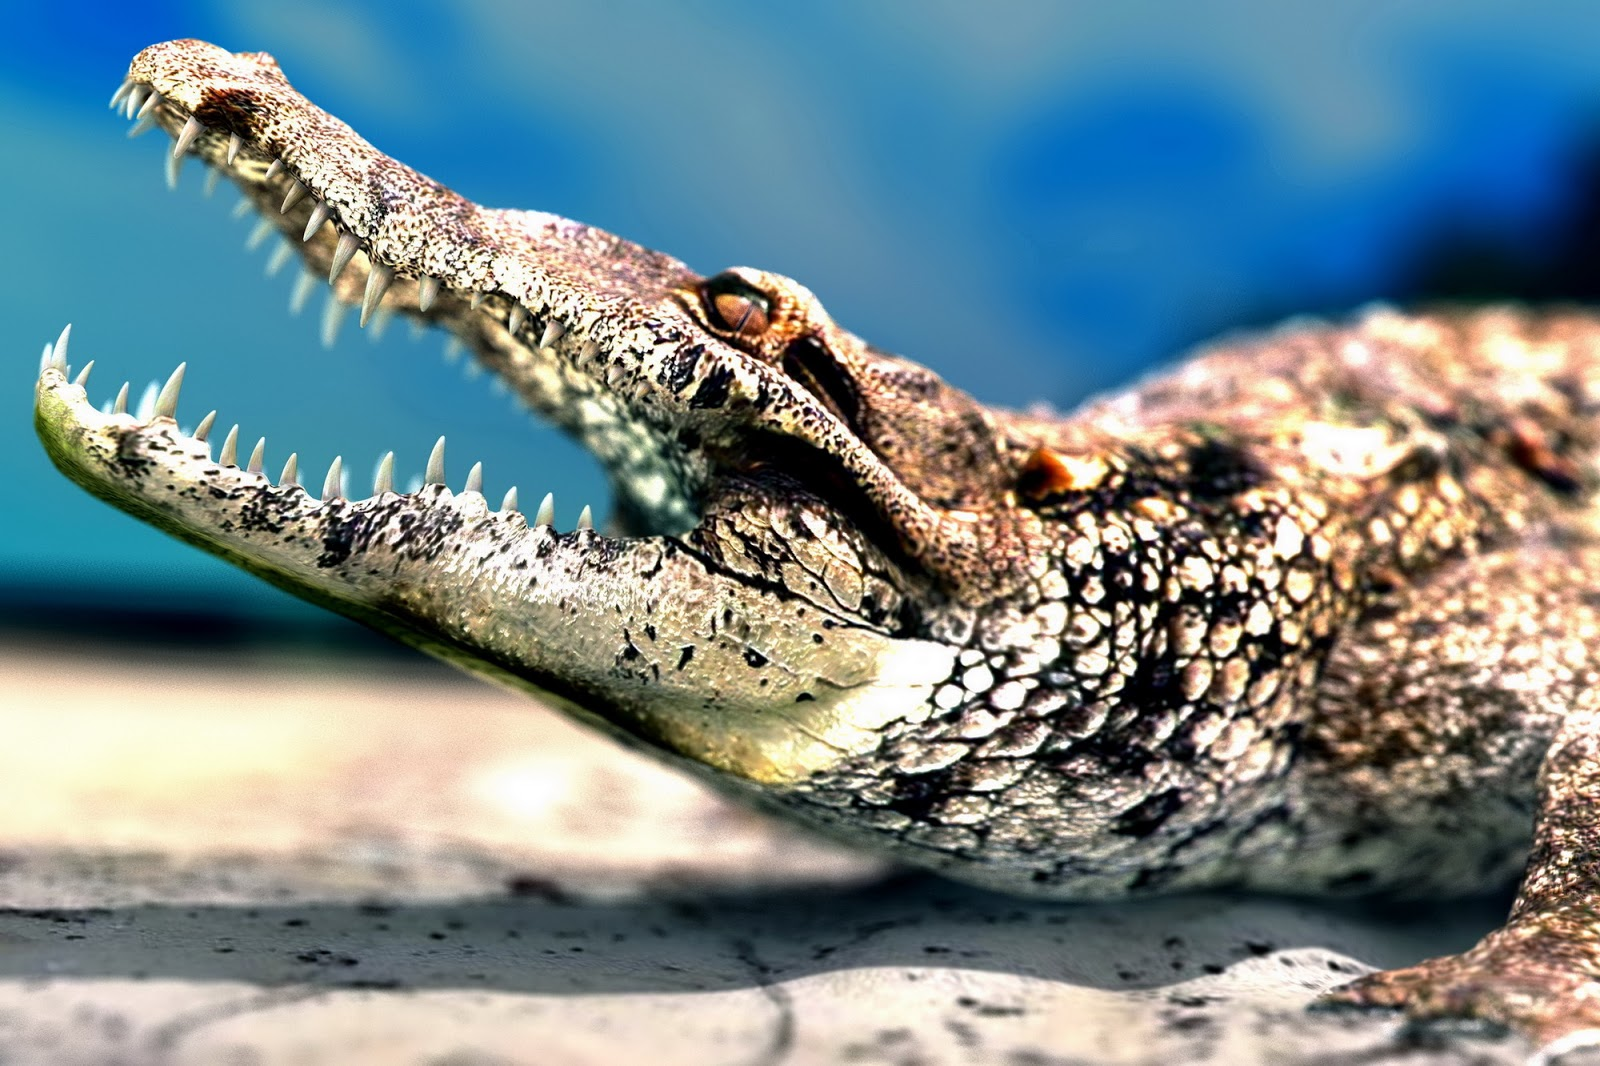 alligator wallpaper for home - photo #42